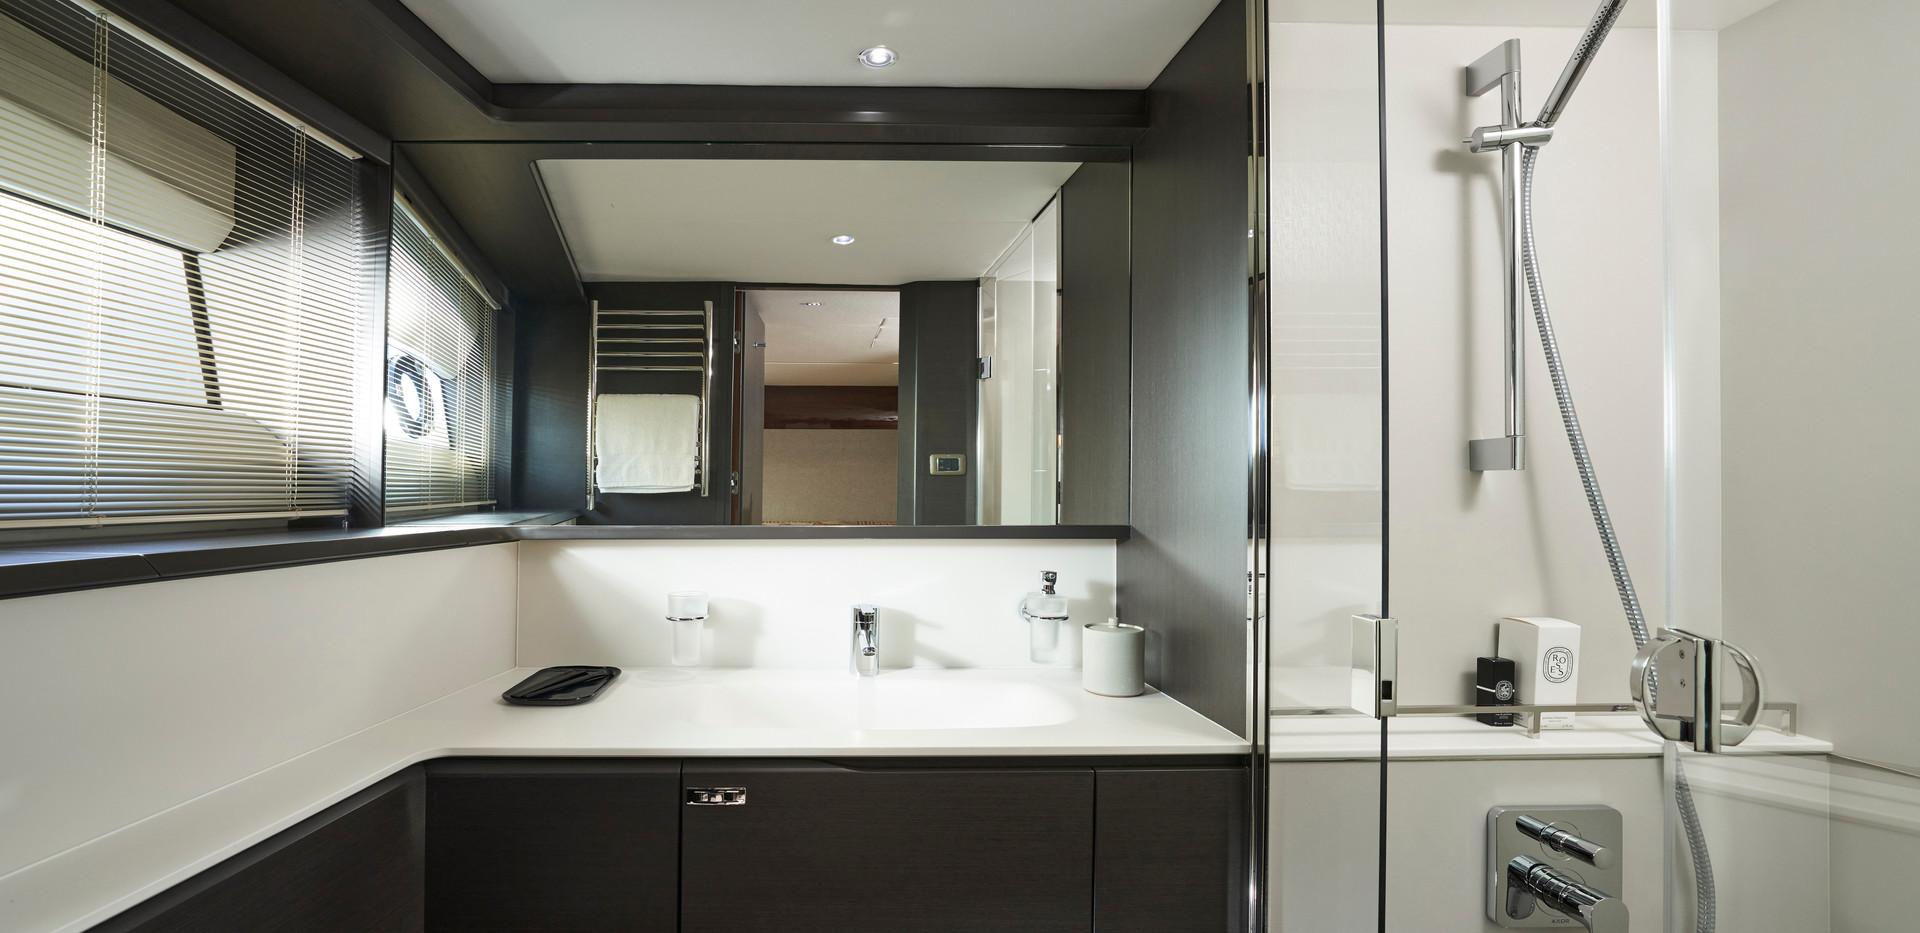 x95-slot-2-interior-port-twin-bathroom-b